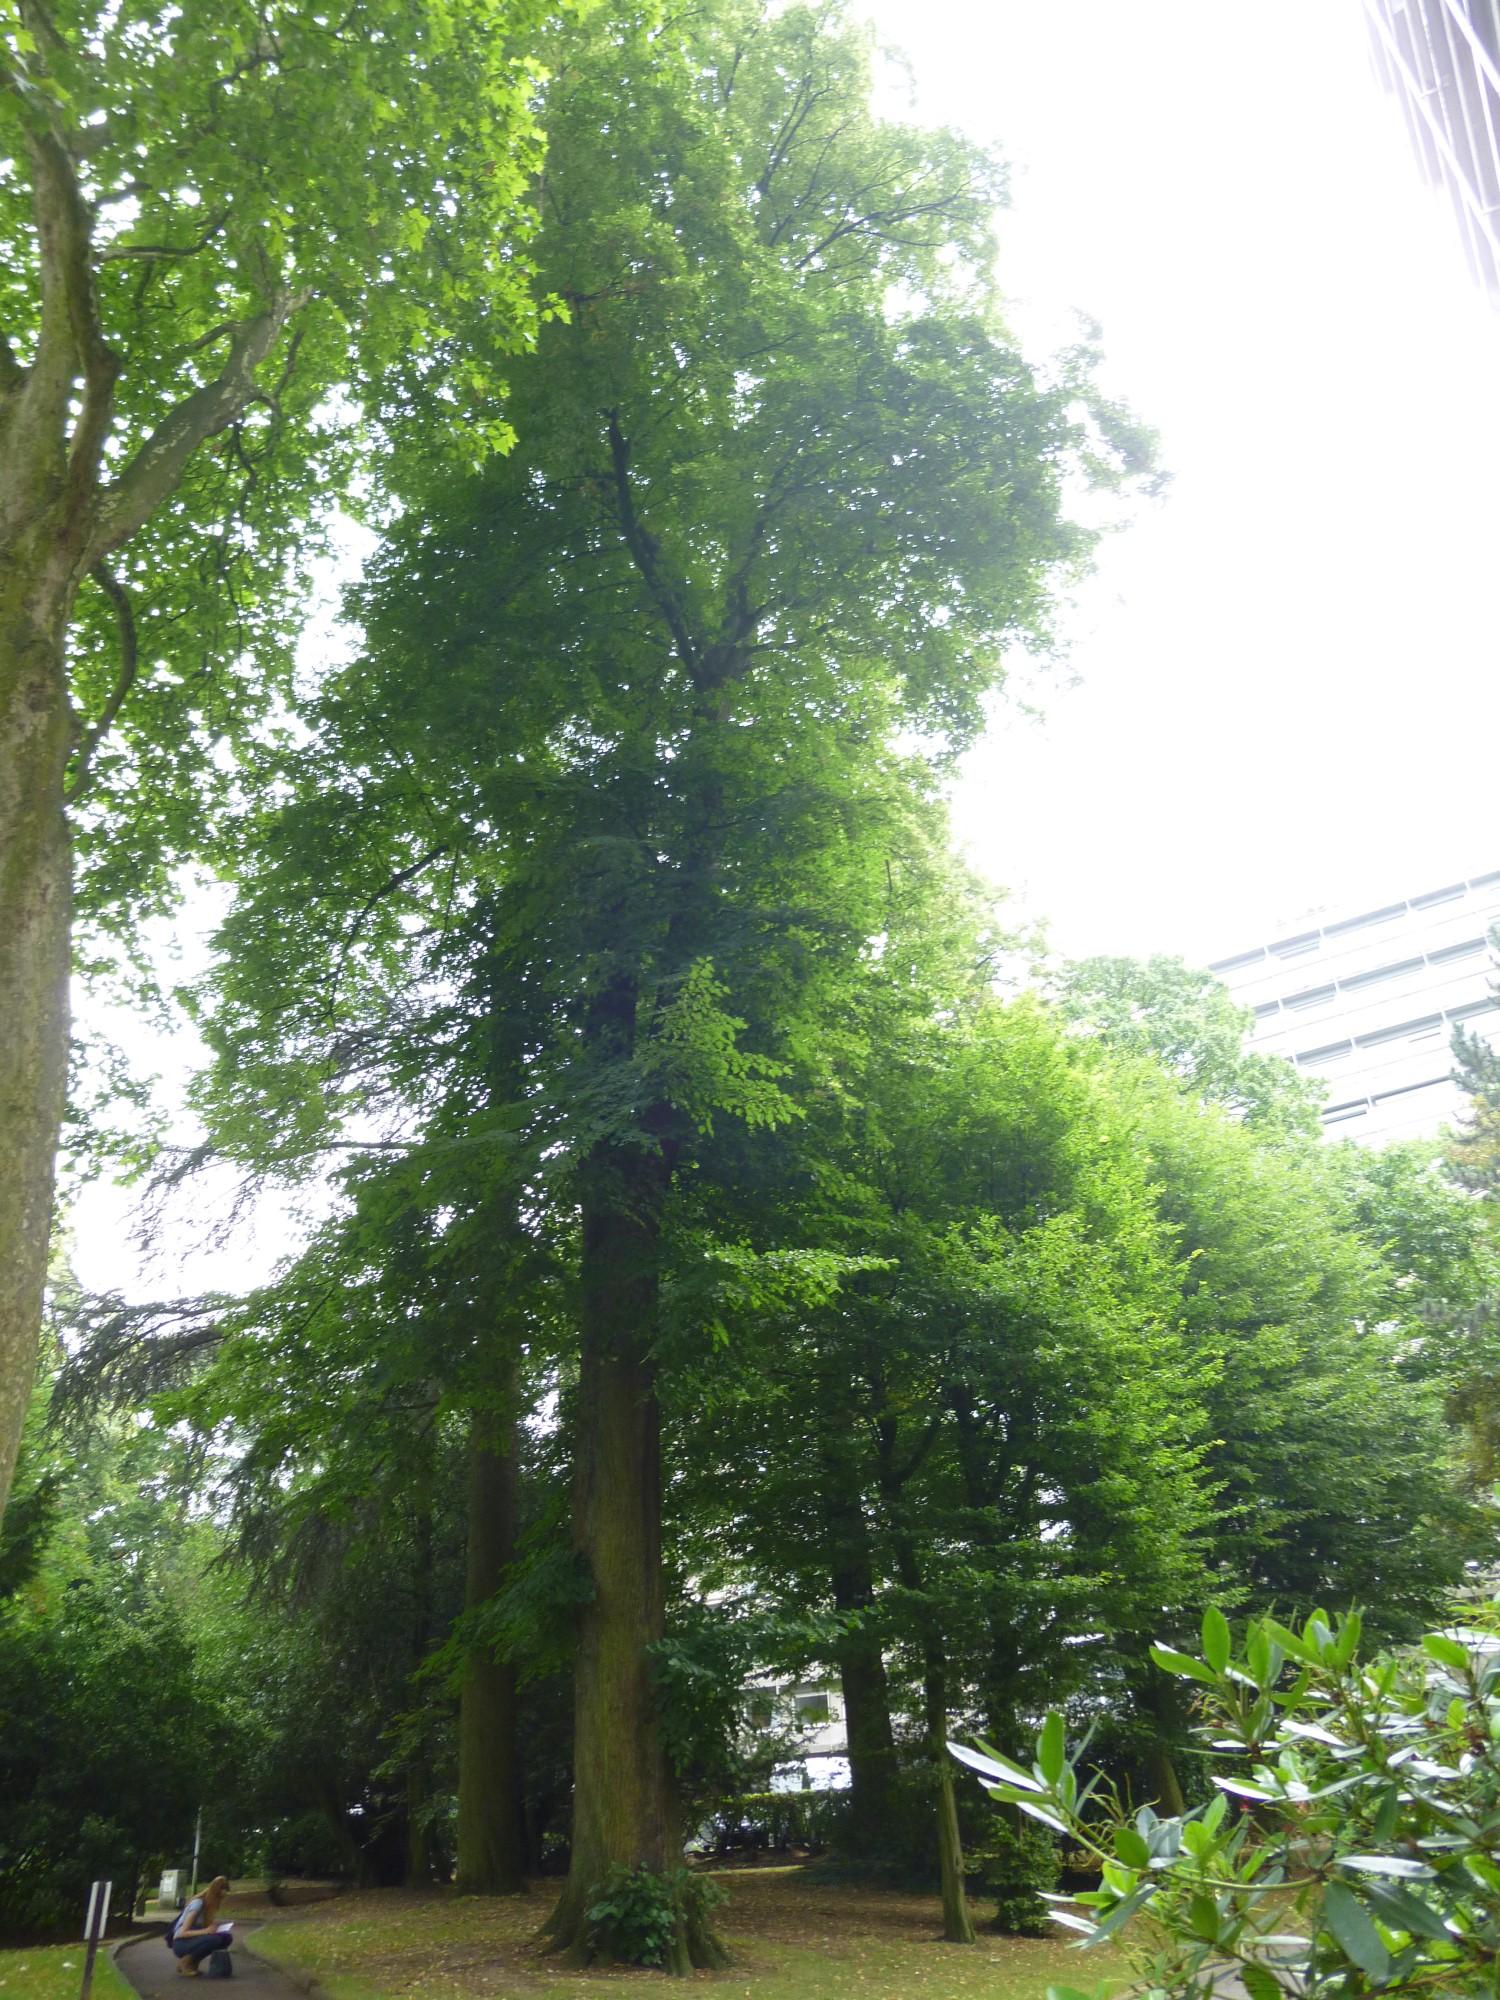 Tilleul commun – Watermael-Boitsfort, Avenue Emile Van Becelaere, 24-26 –  29 Juillet 2014